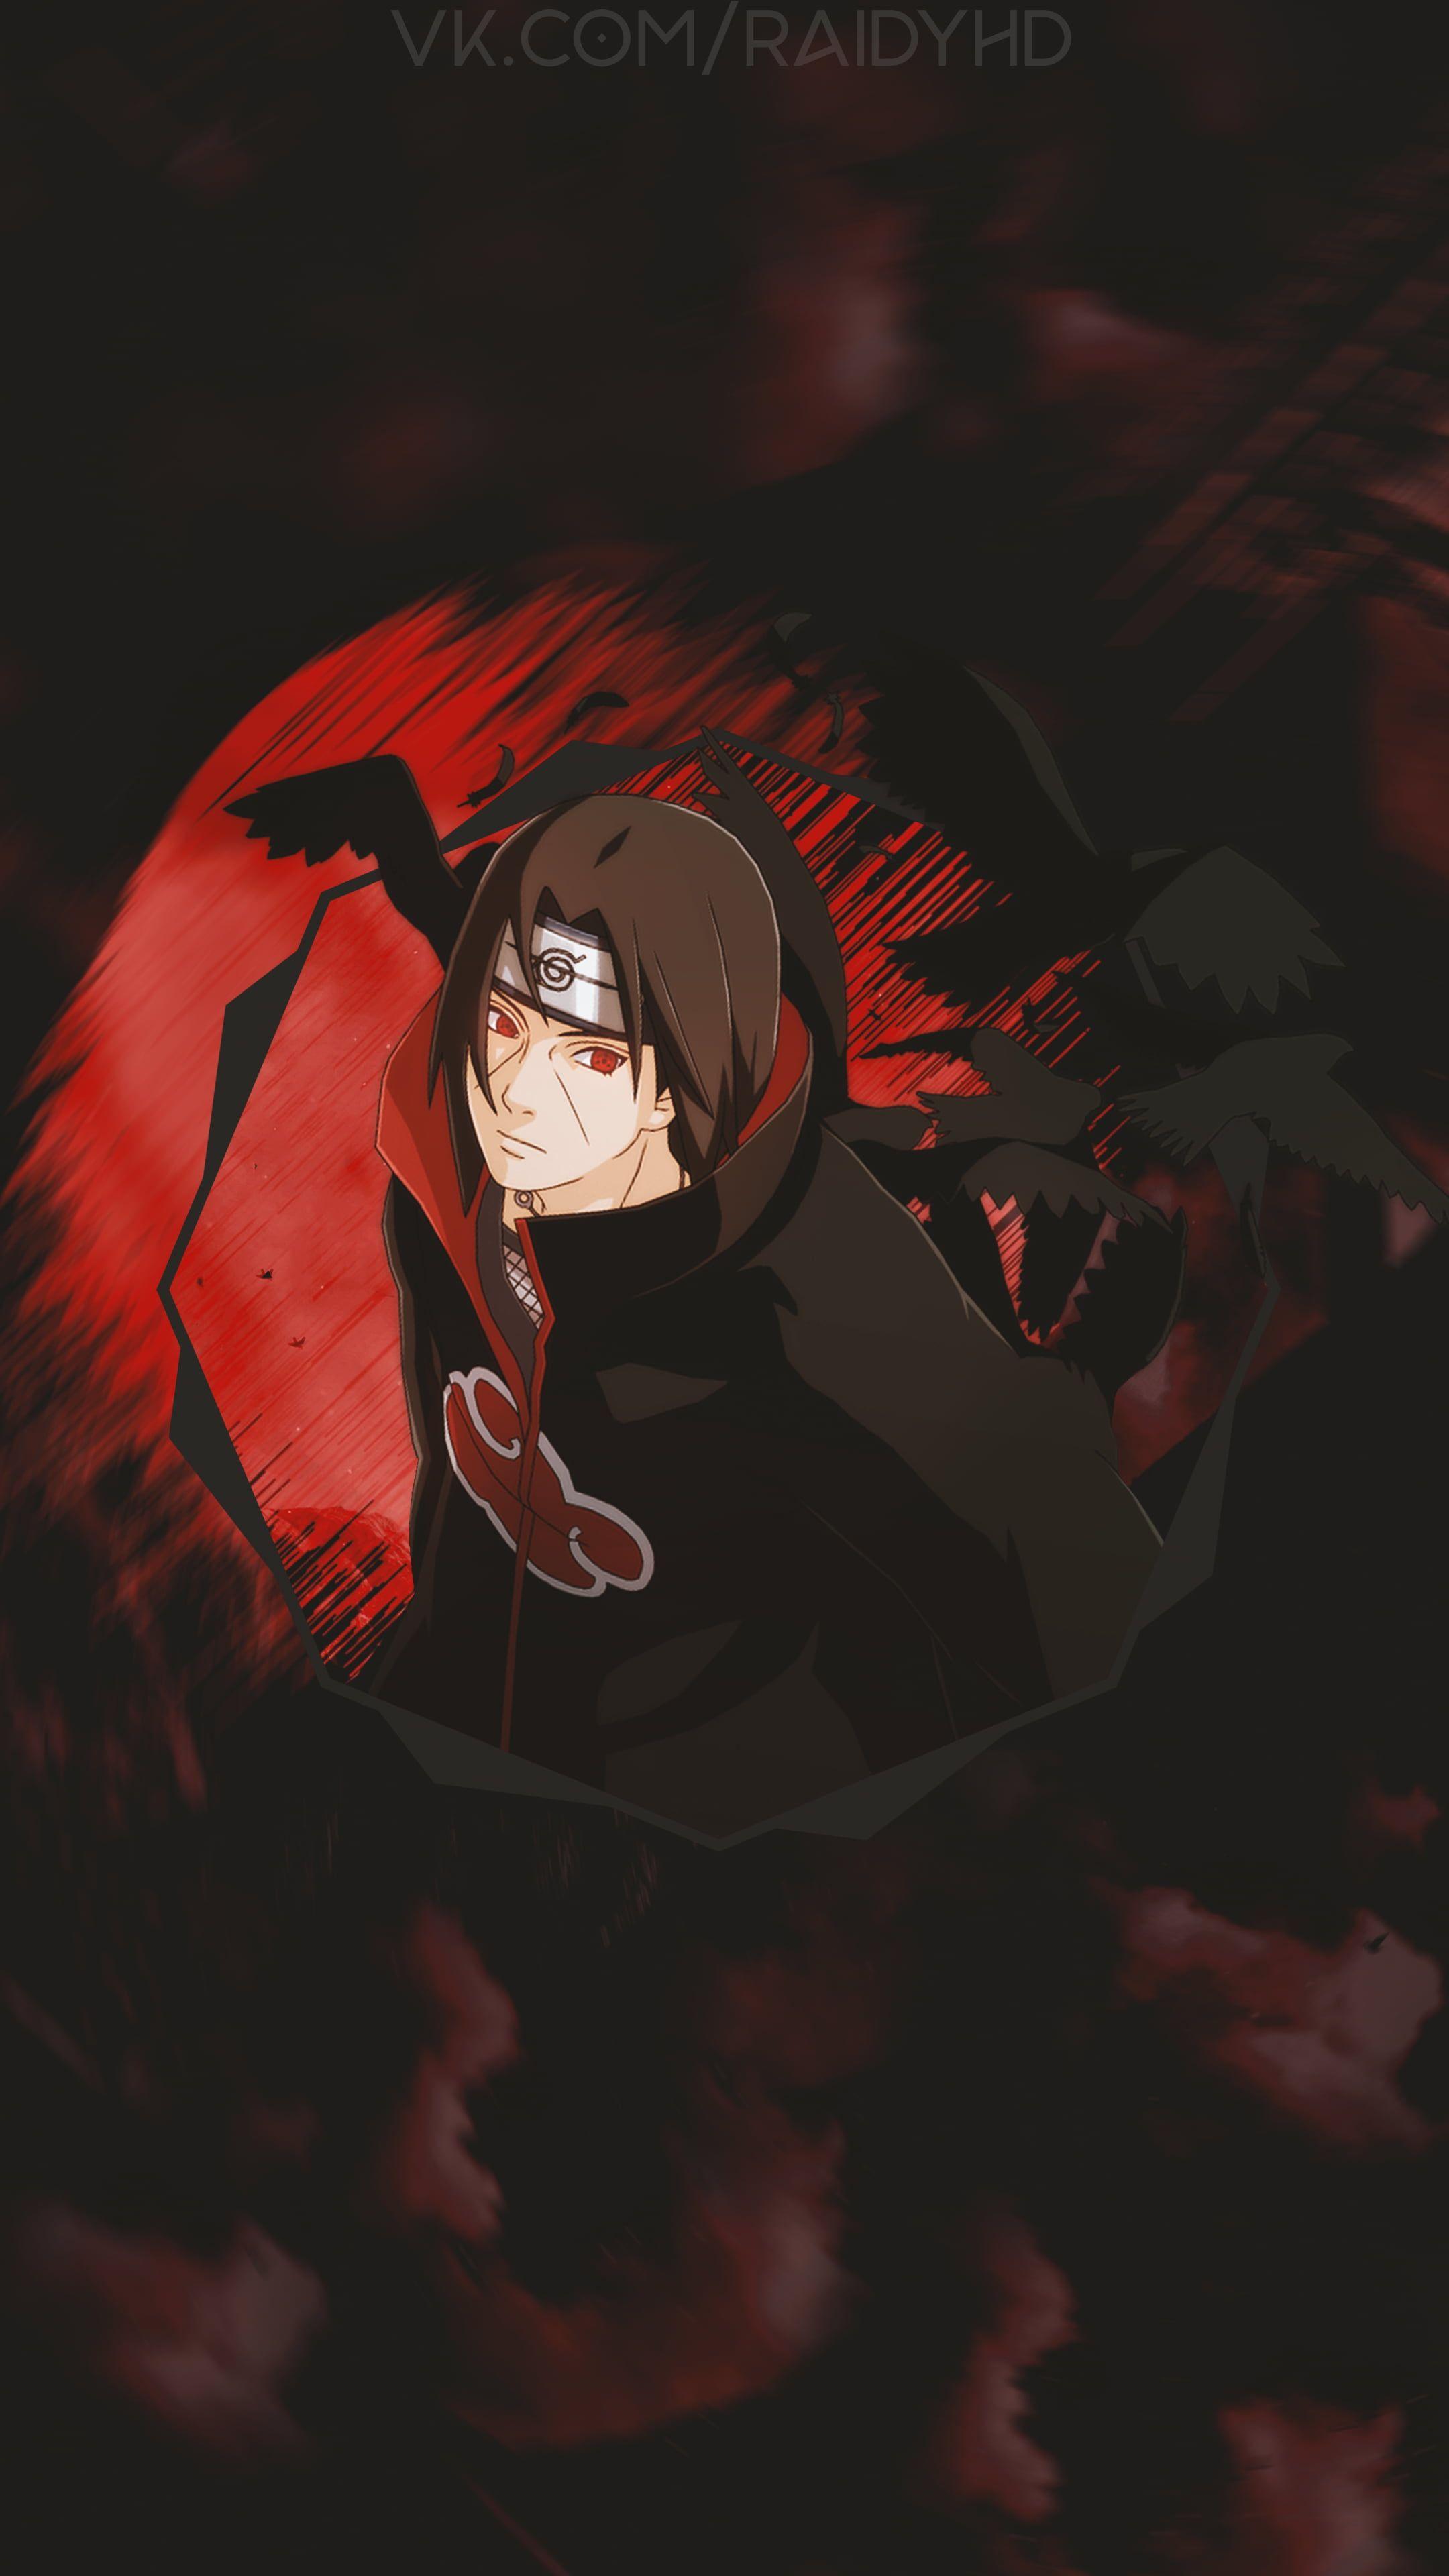 Picture In Picture Anime Boys Anime Uchiha Itachi 4k Wallpaper Hdwallpaper Desktop Anime Naruto Naruto Uzumaki Shippuden Naruto Art